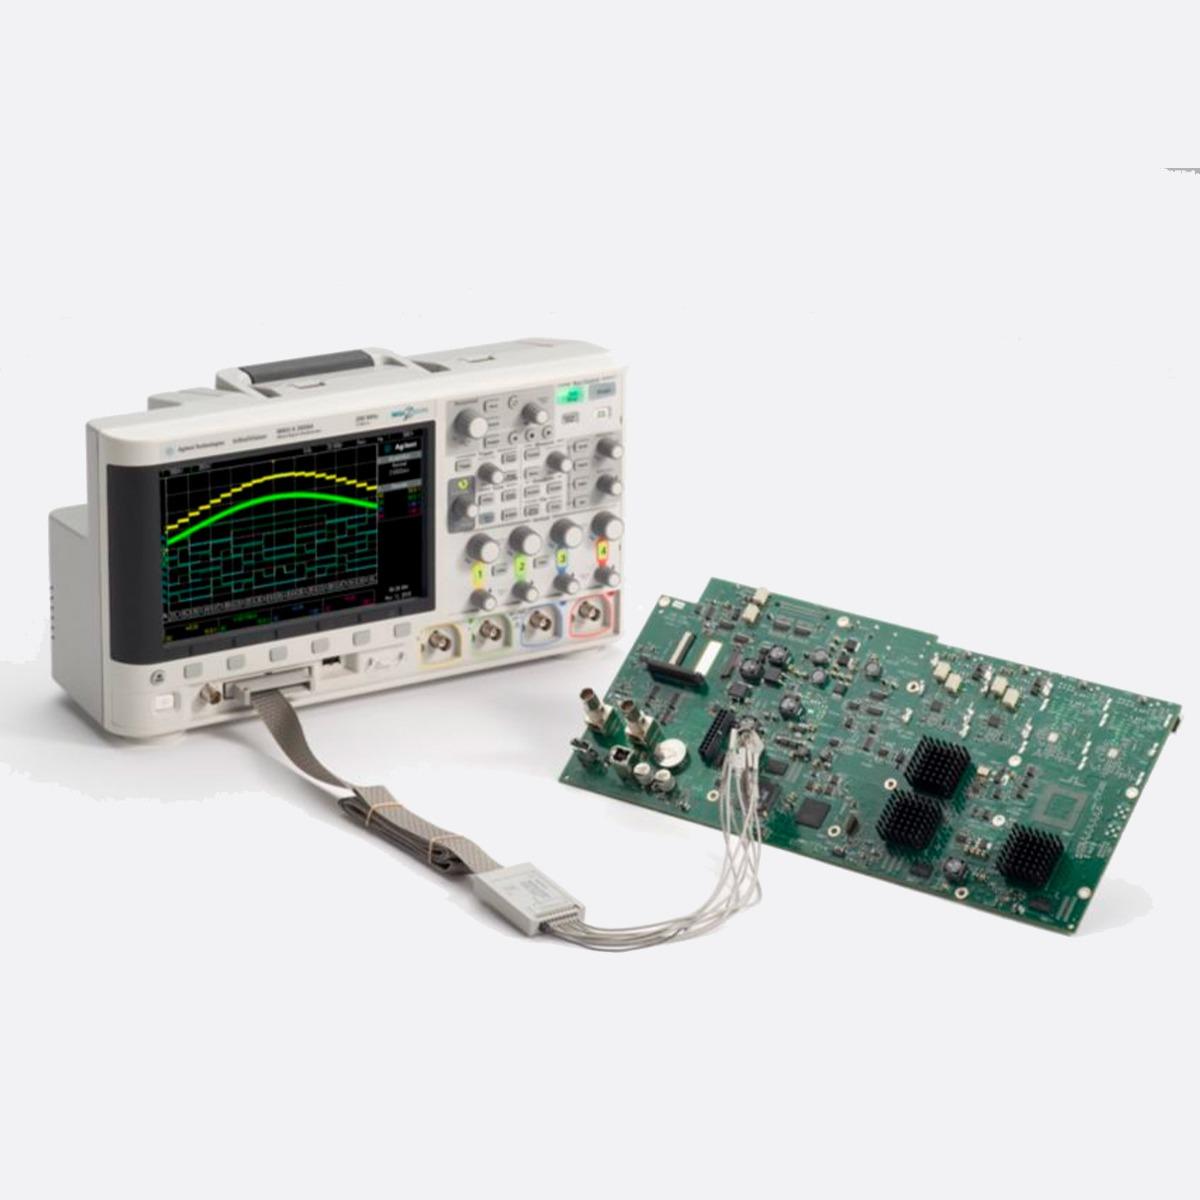 Keysight_MSOX2004A_Connection_Ccontrols